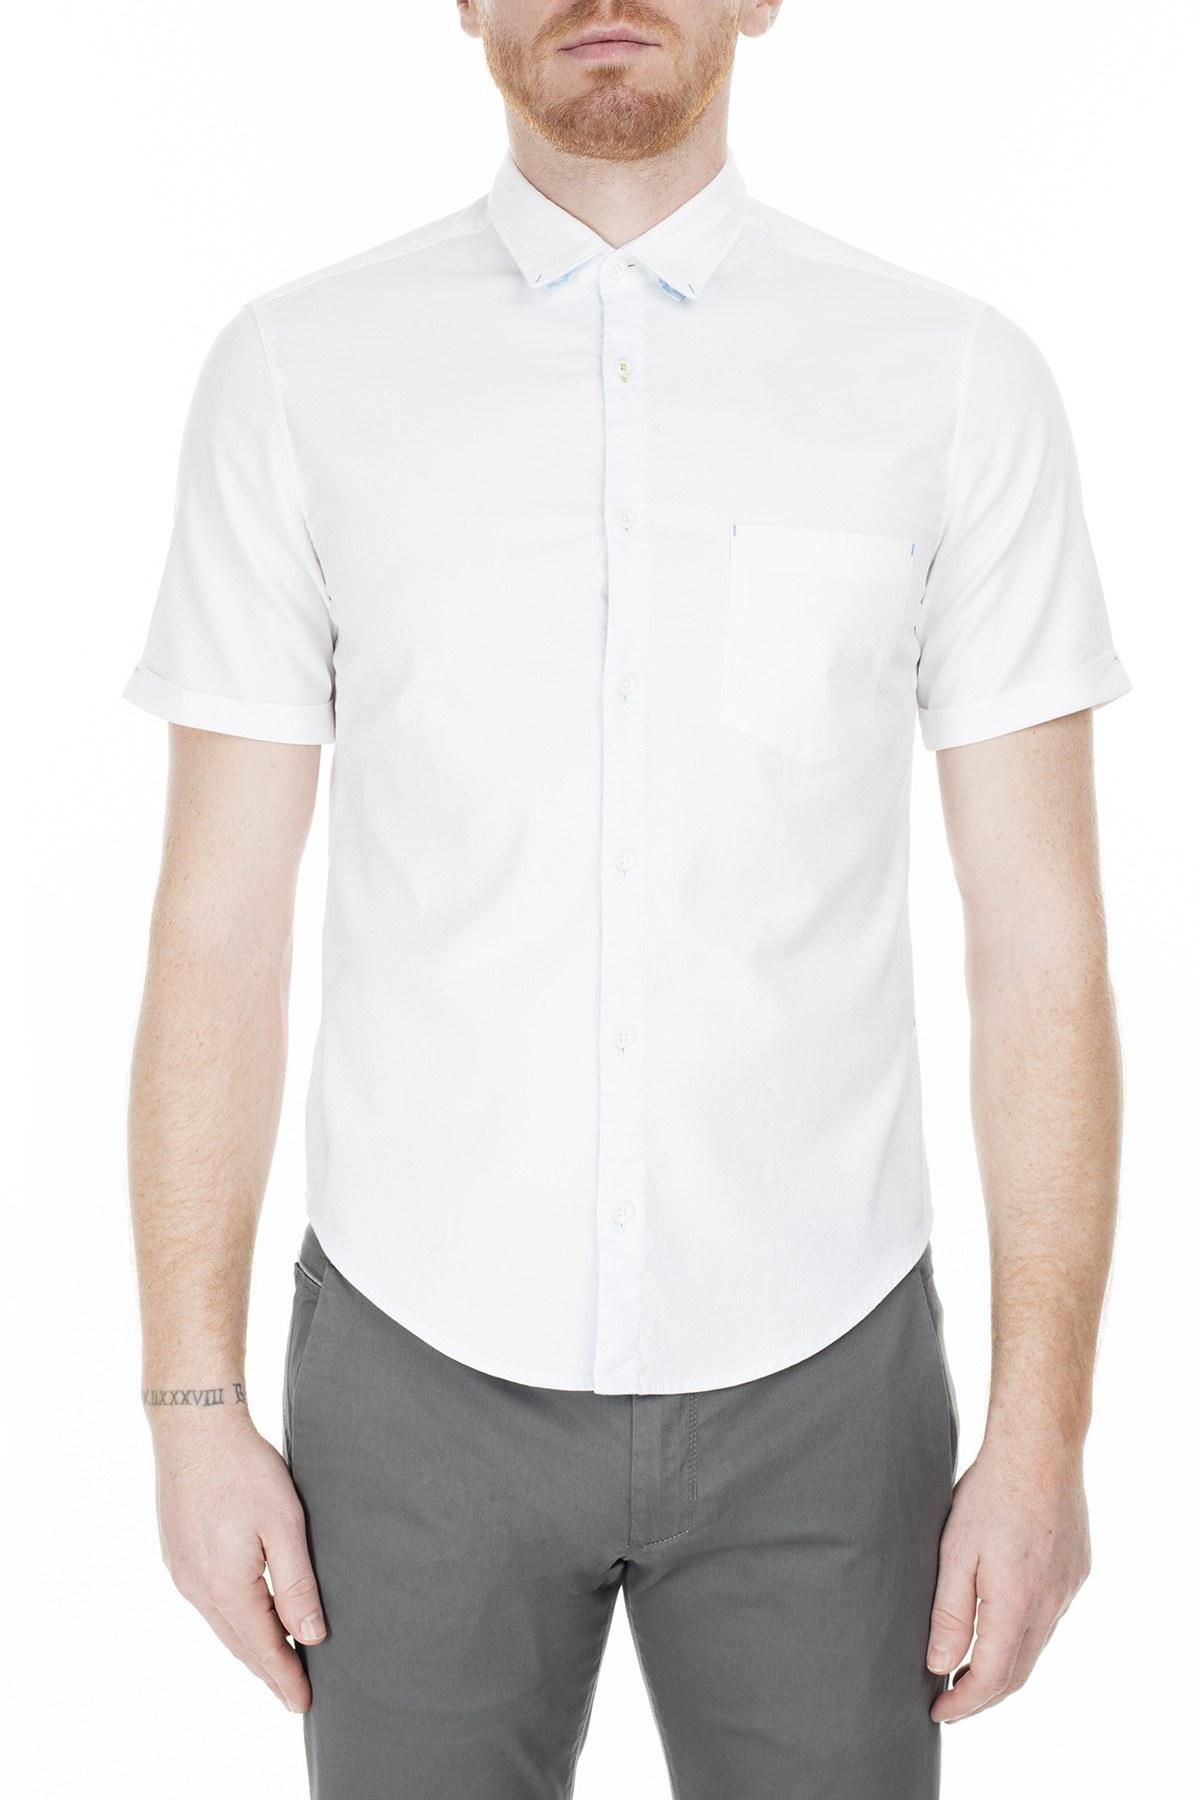 Hugo Boss Regular Fit Erkek Gömlek S 50381583 100 BEYAZ